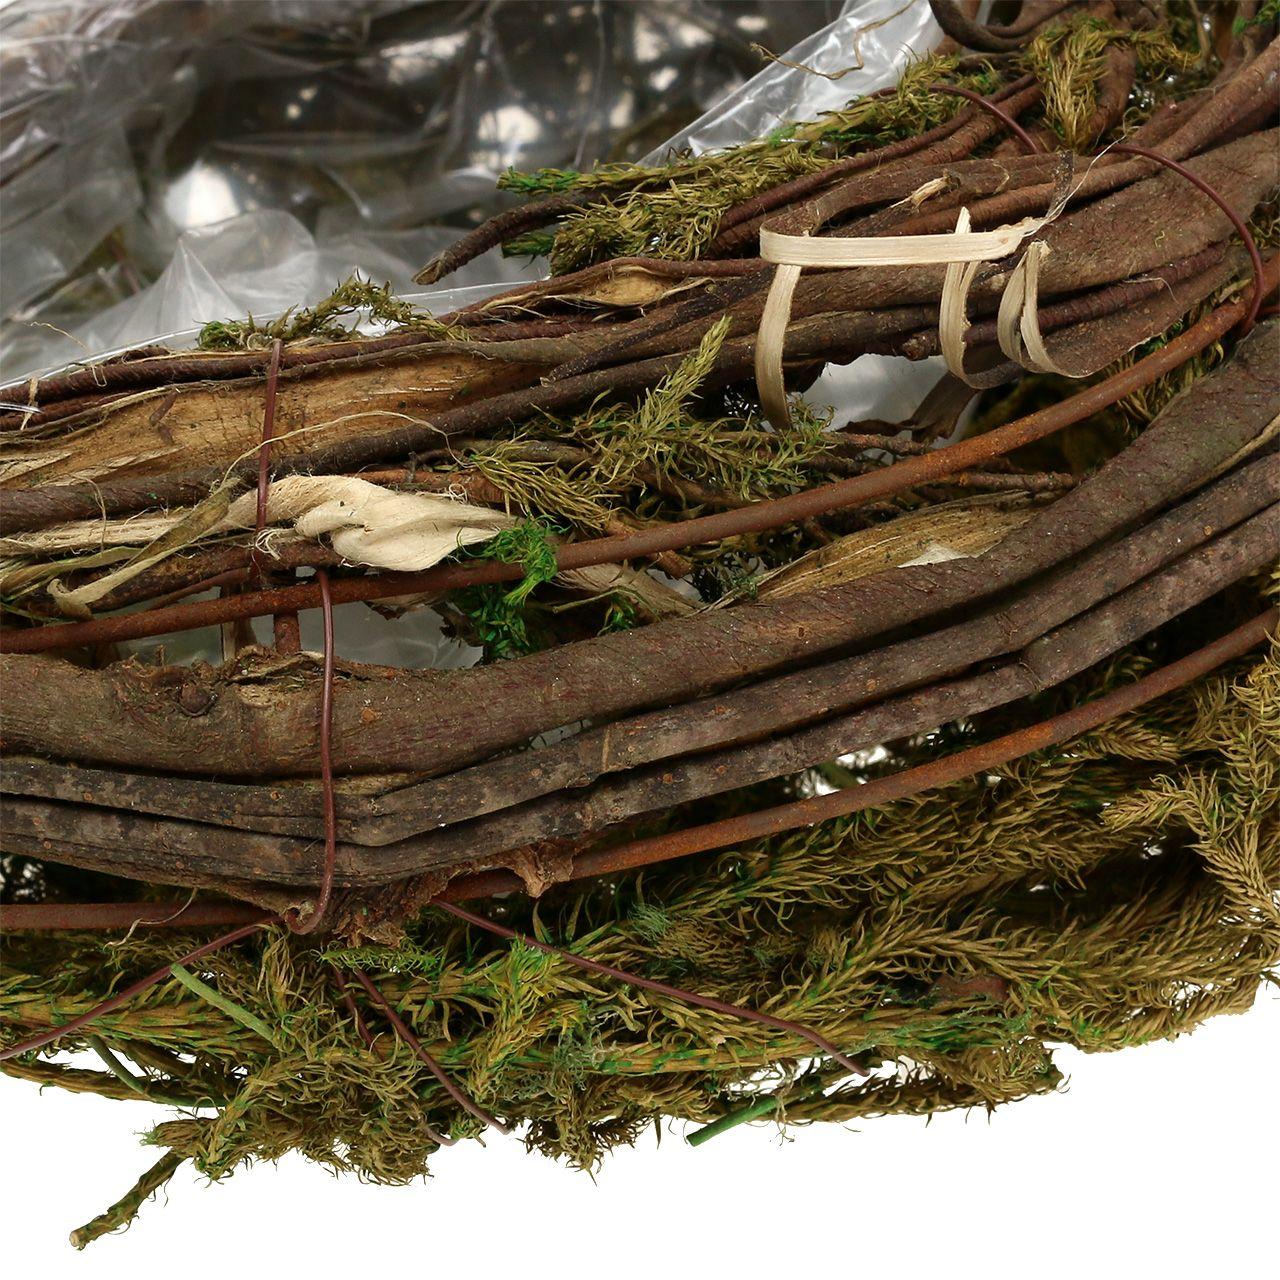 Planter made of vines and moss 35cm x 20cm